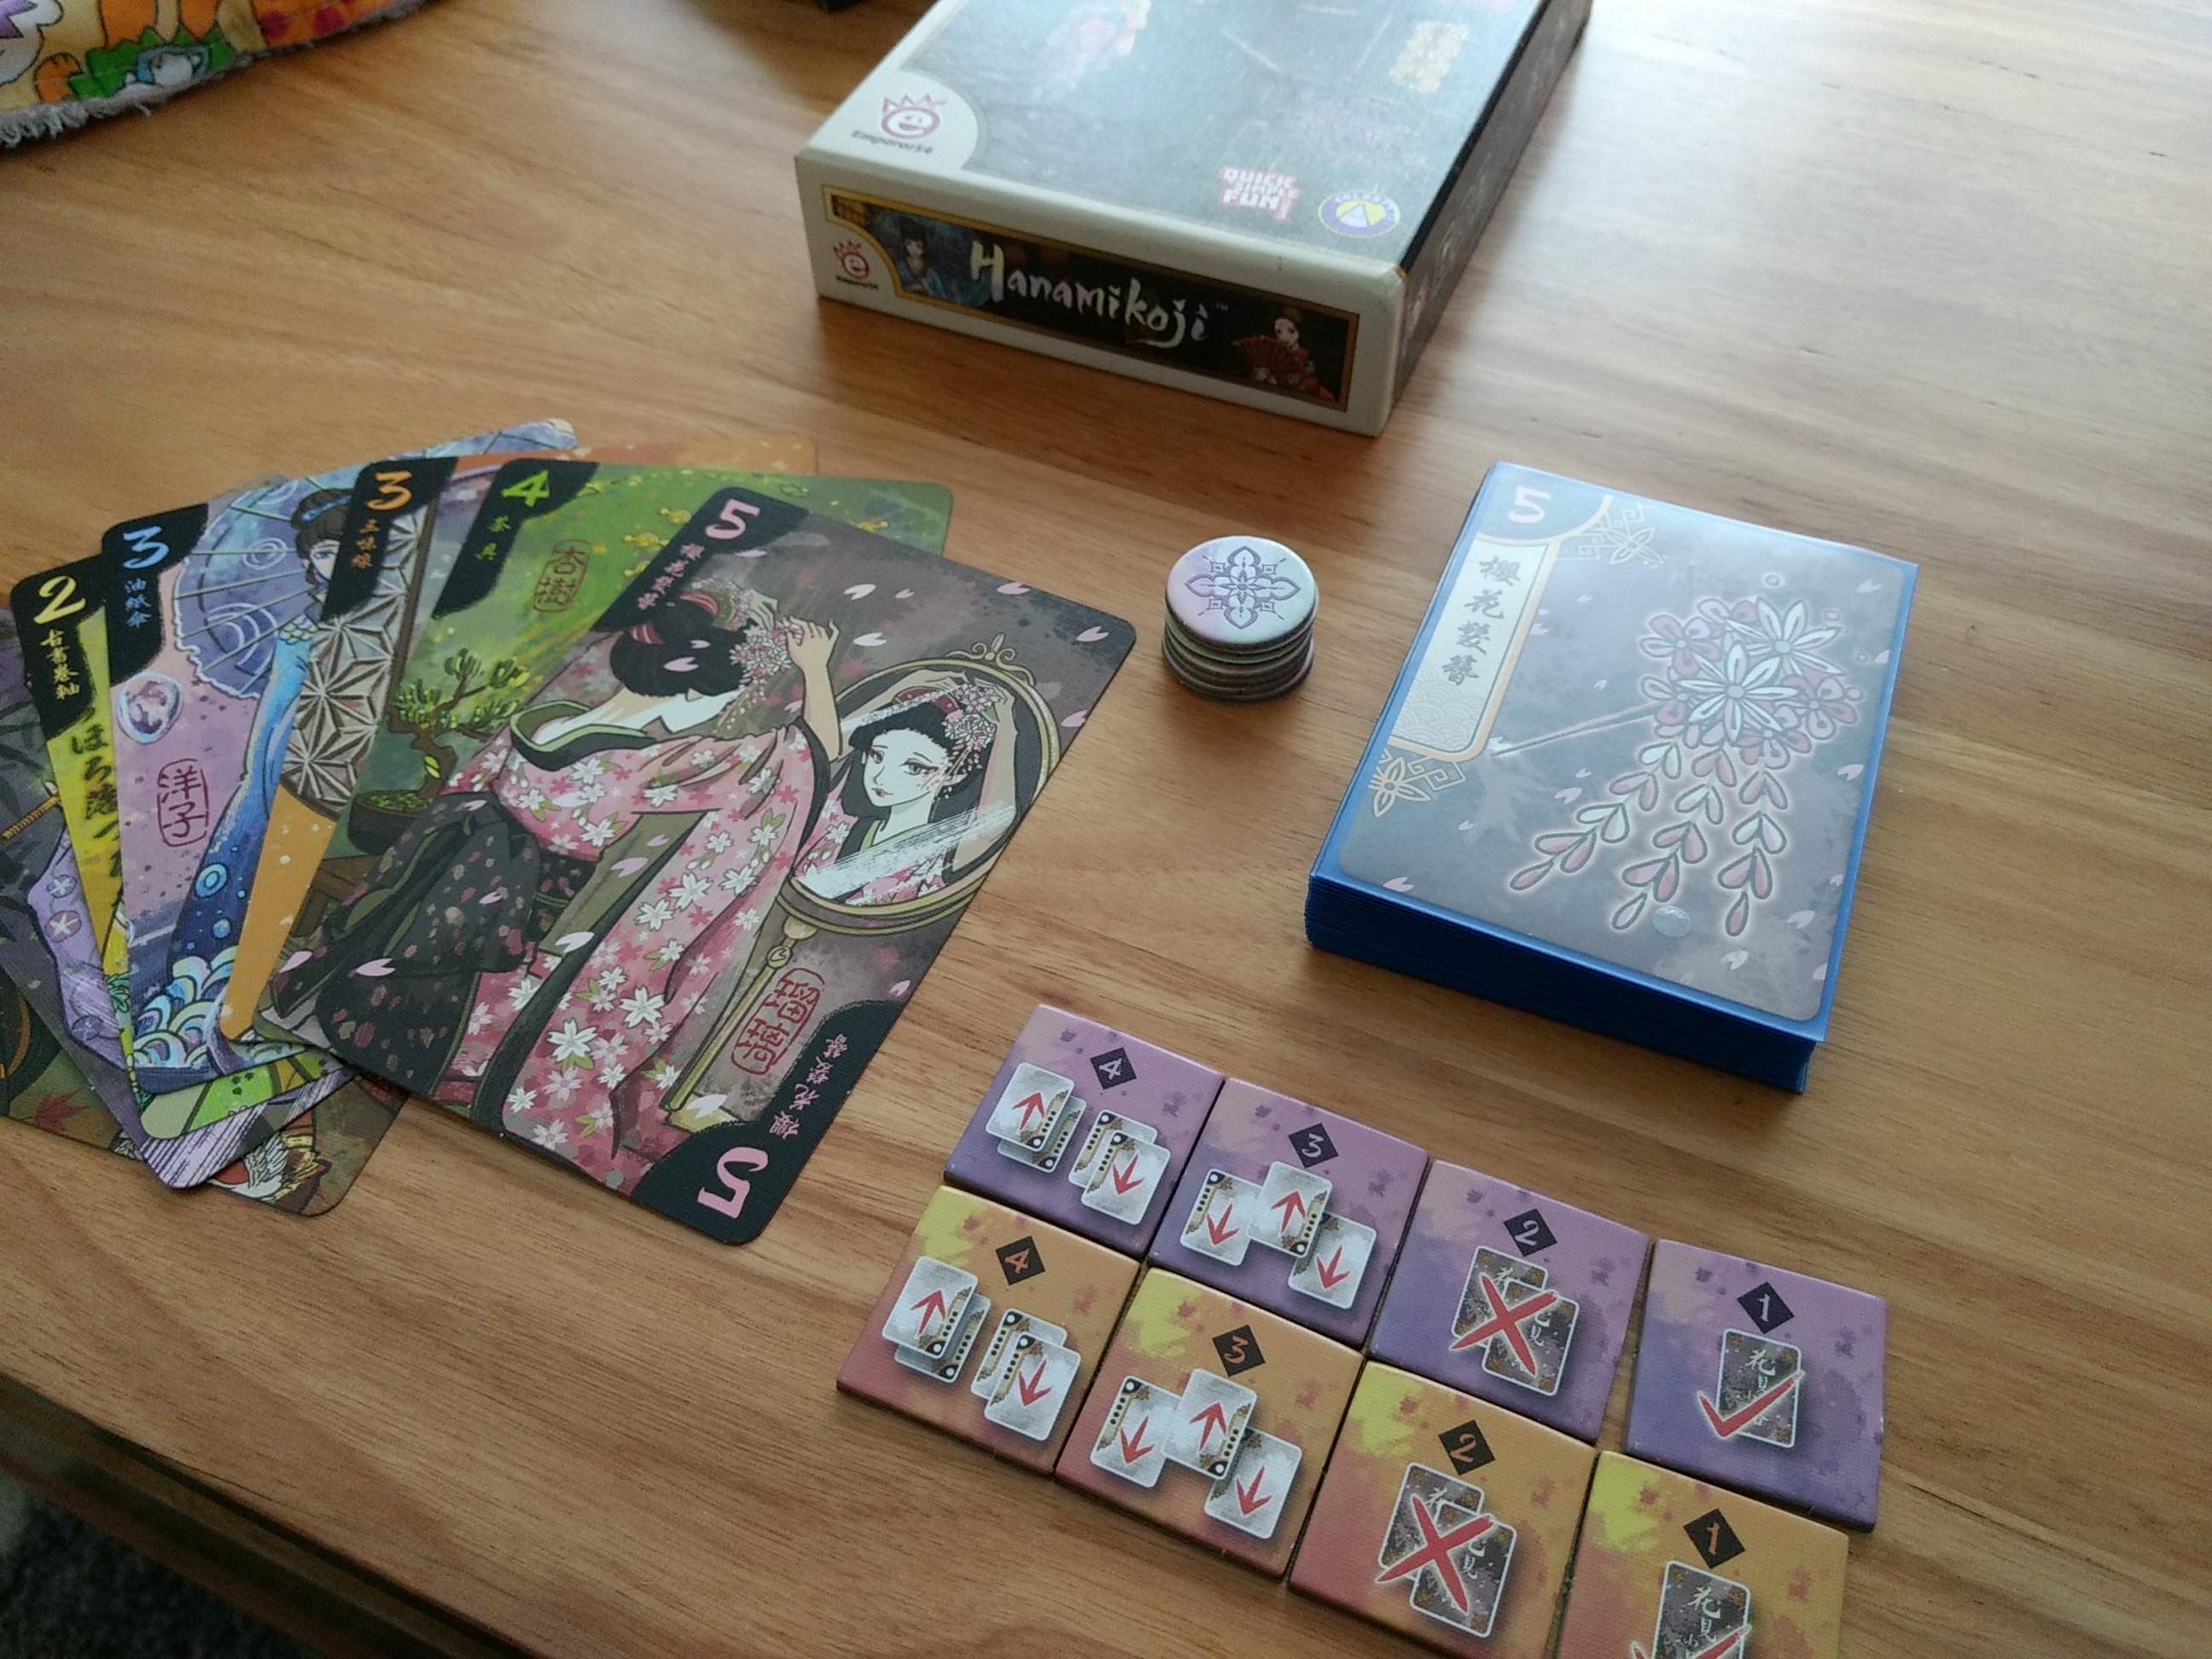 r2r-board-game-review-hanamikoji-componentst